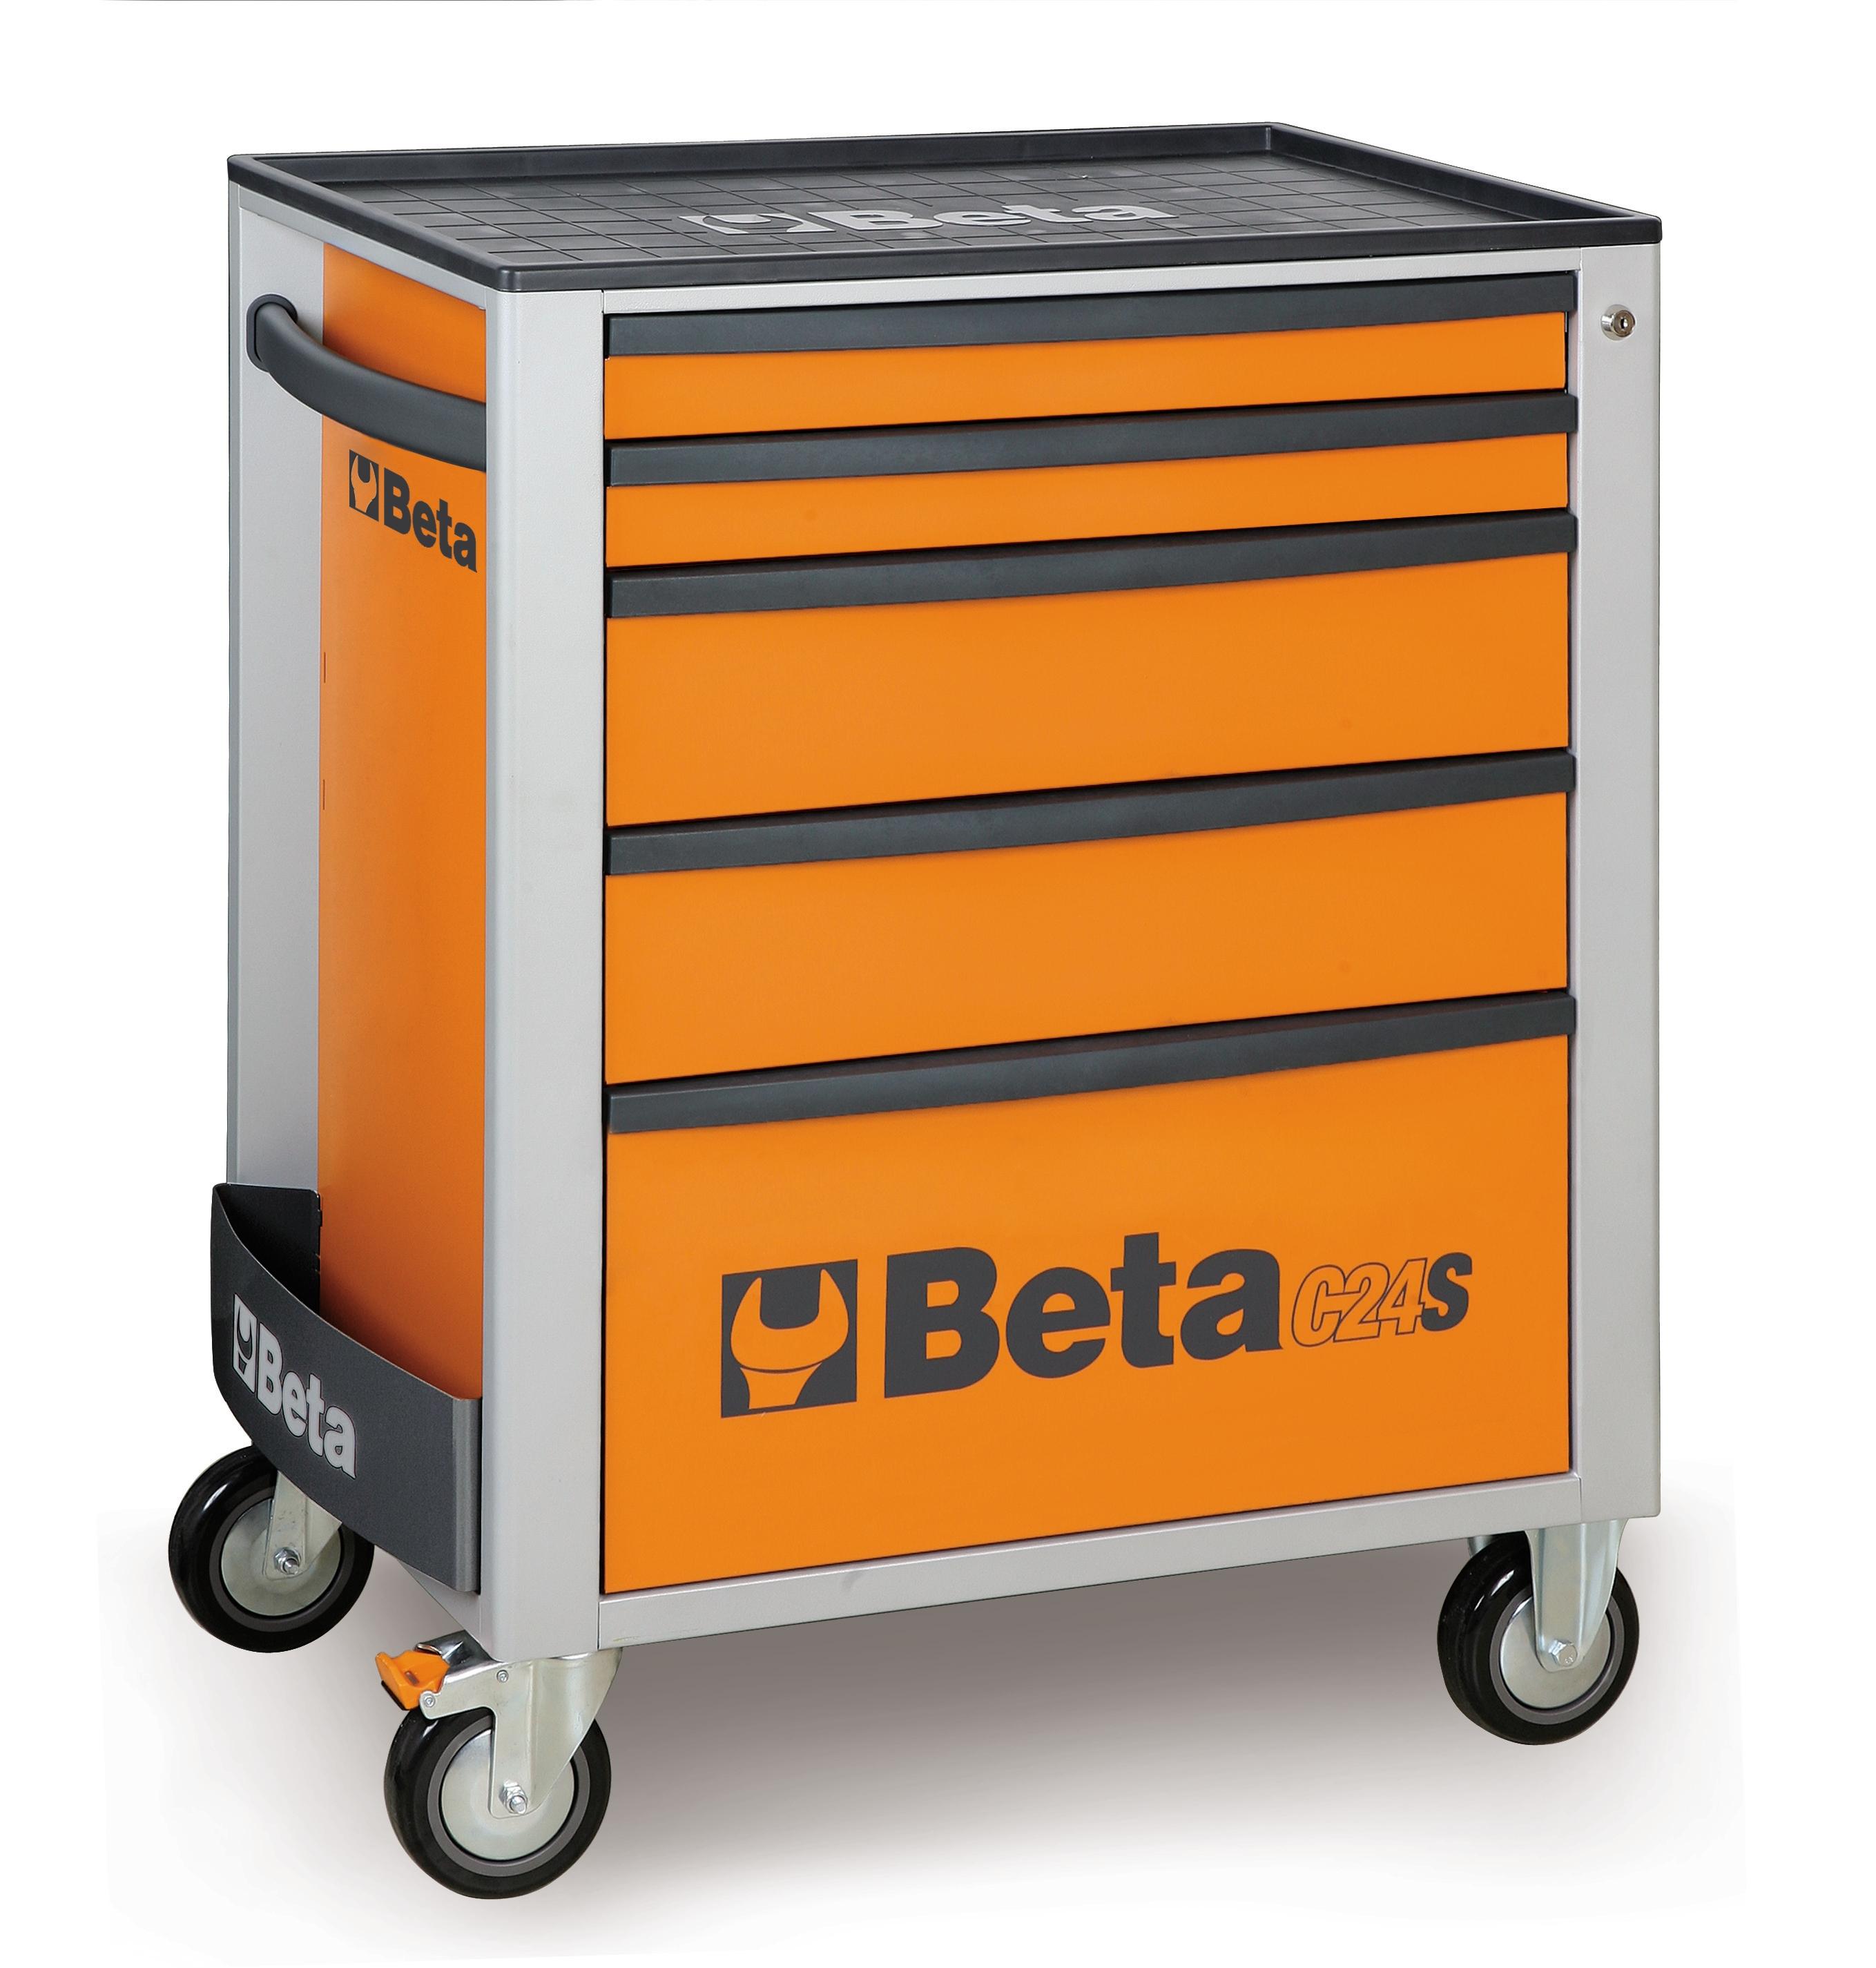 Cassettiere C24S/5 - 2400S5 - BETA Utensili